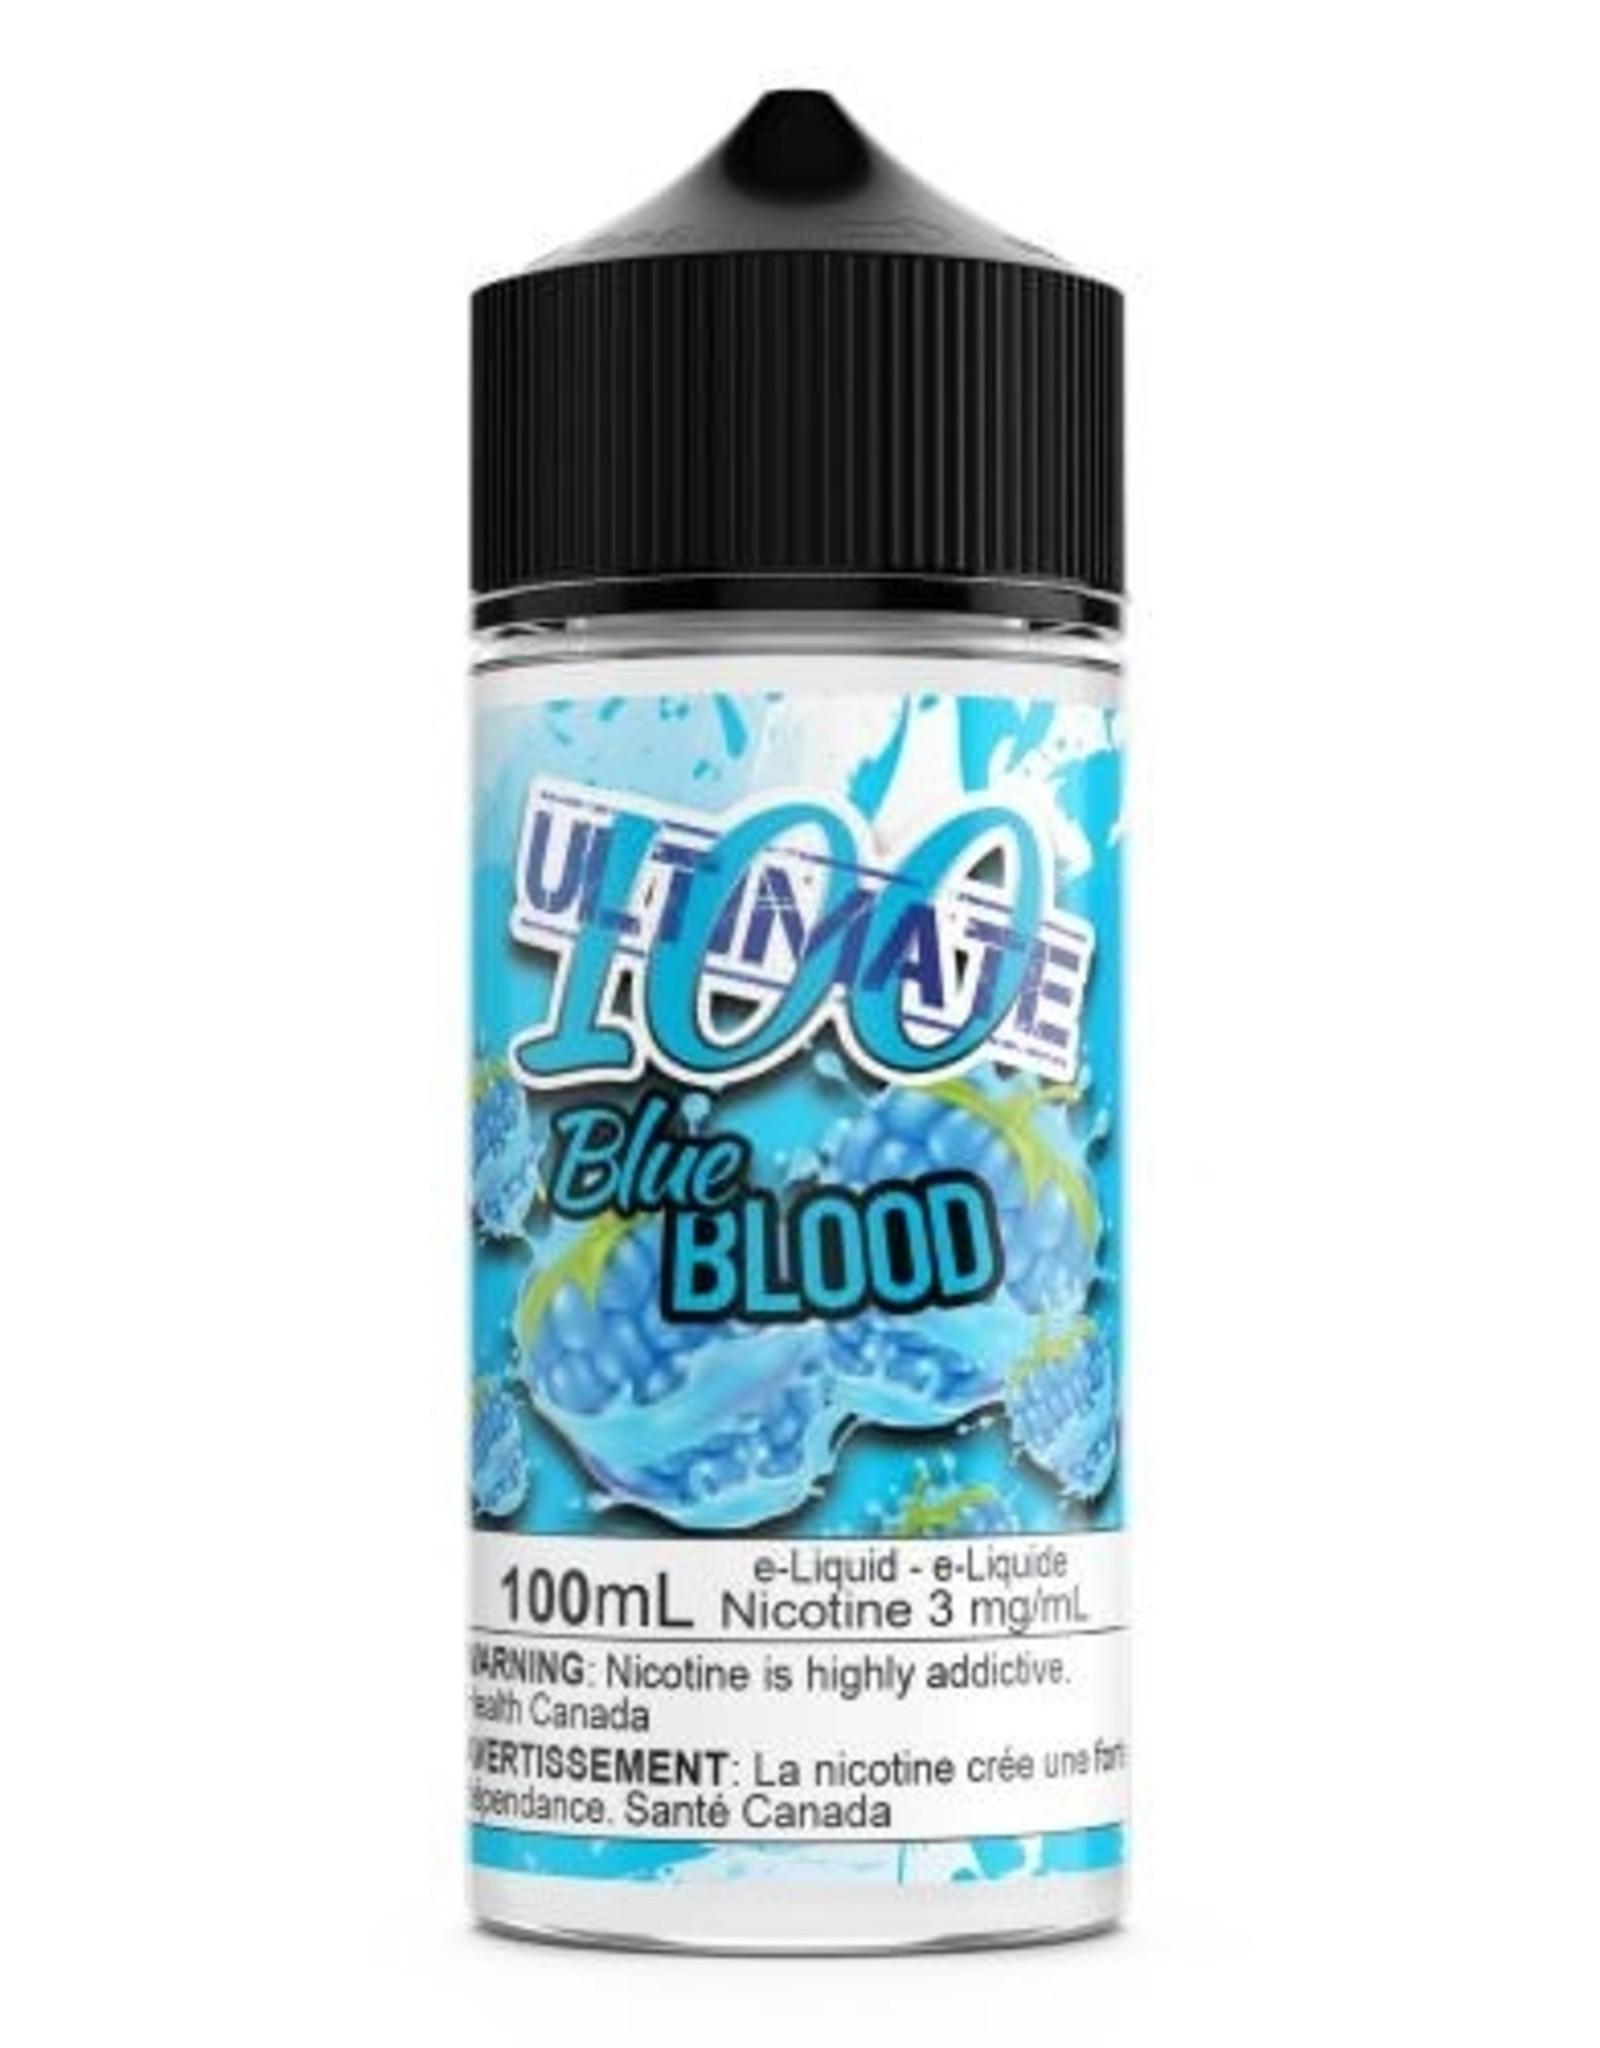 Ultimate 100 Ultimate 100 (100 mL) Blue Blood 3